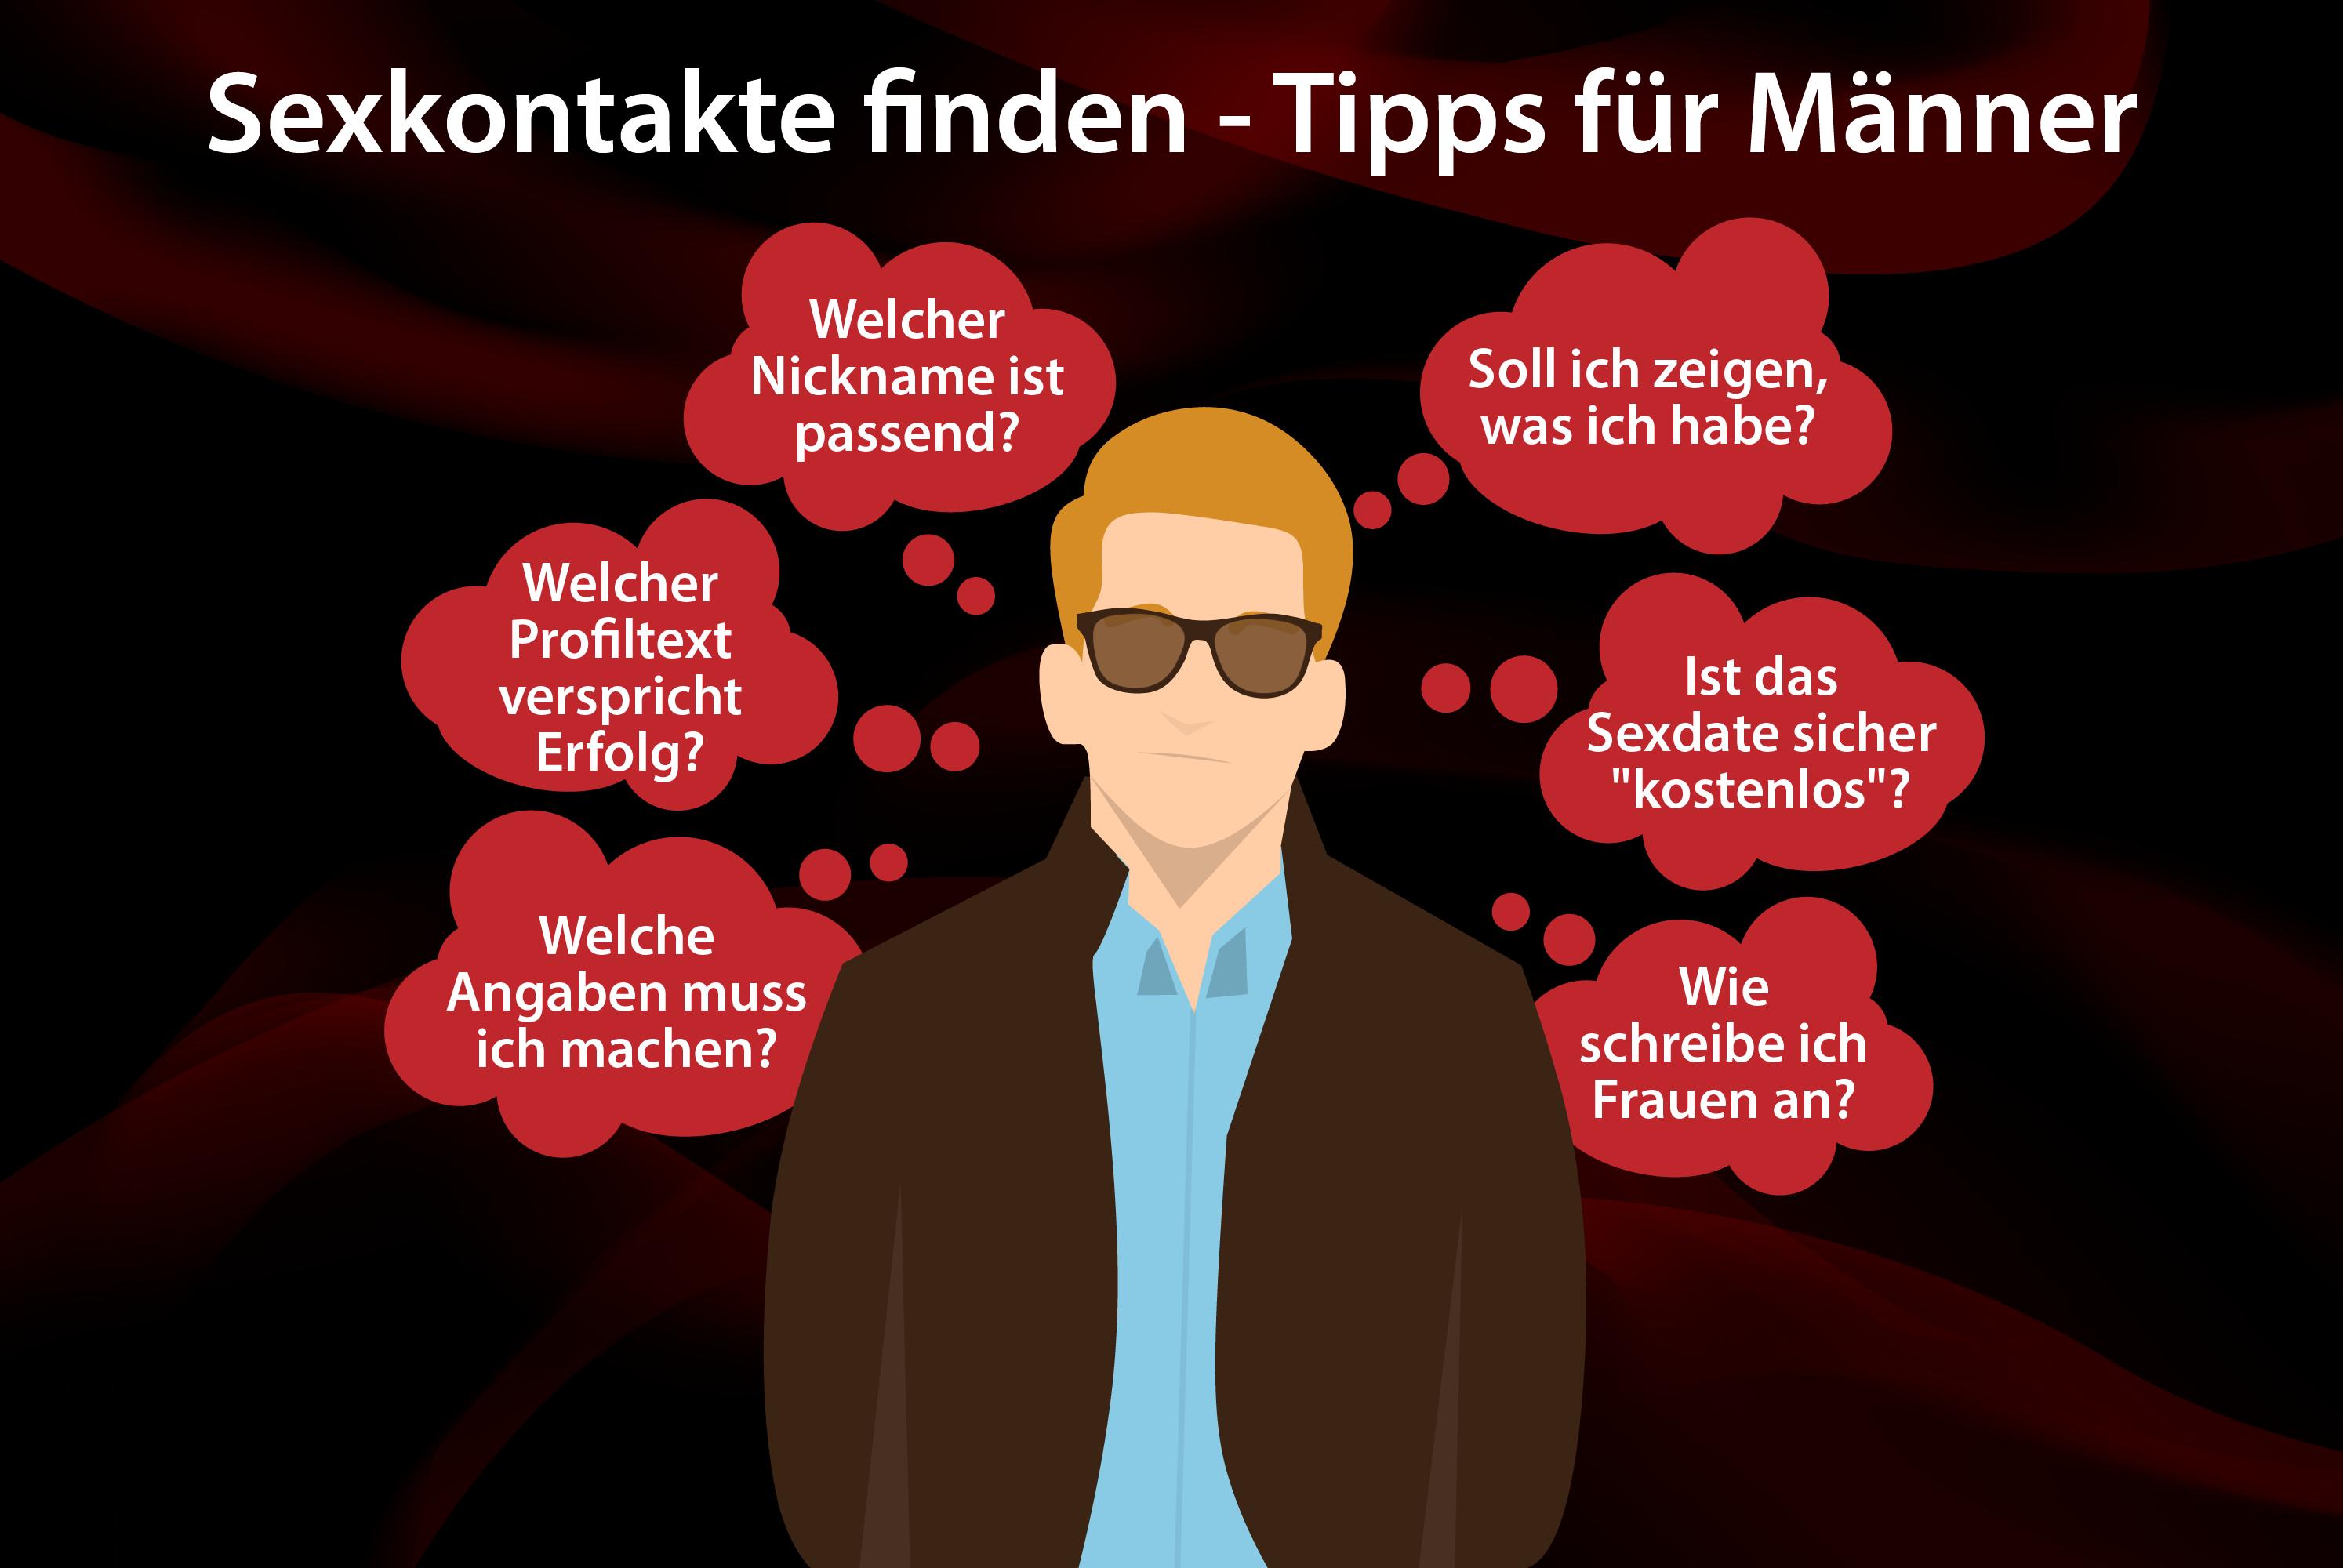 Sexkontakte Tipps fuer Maenner